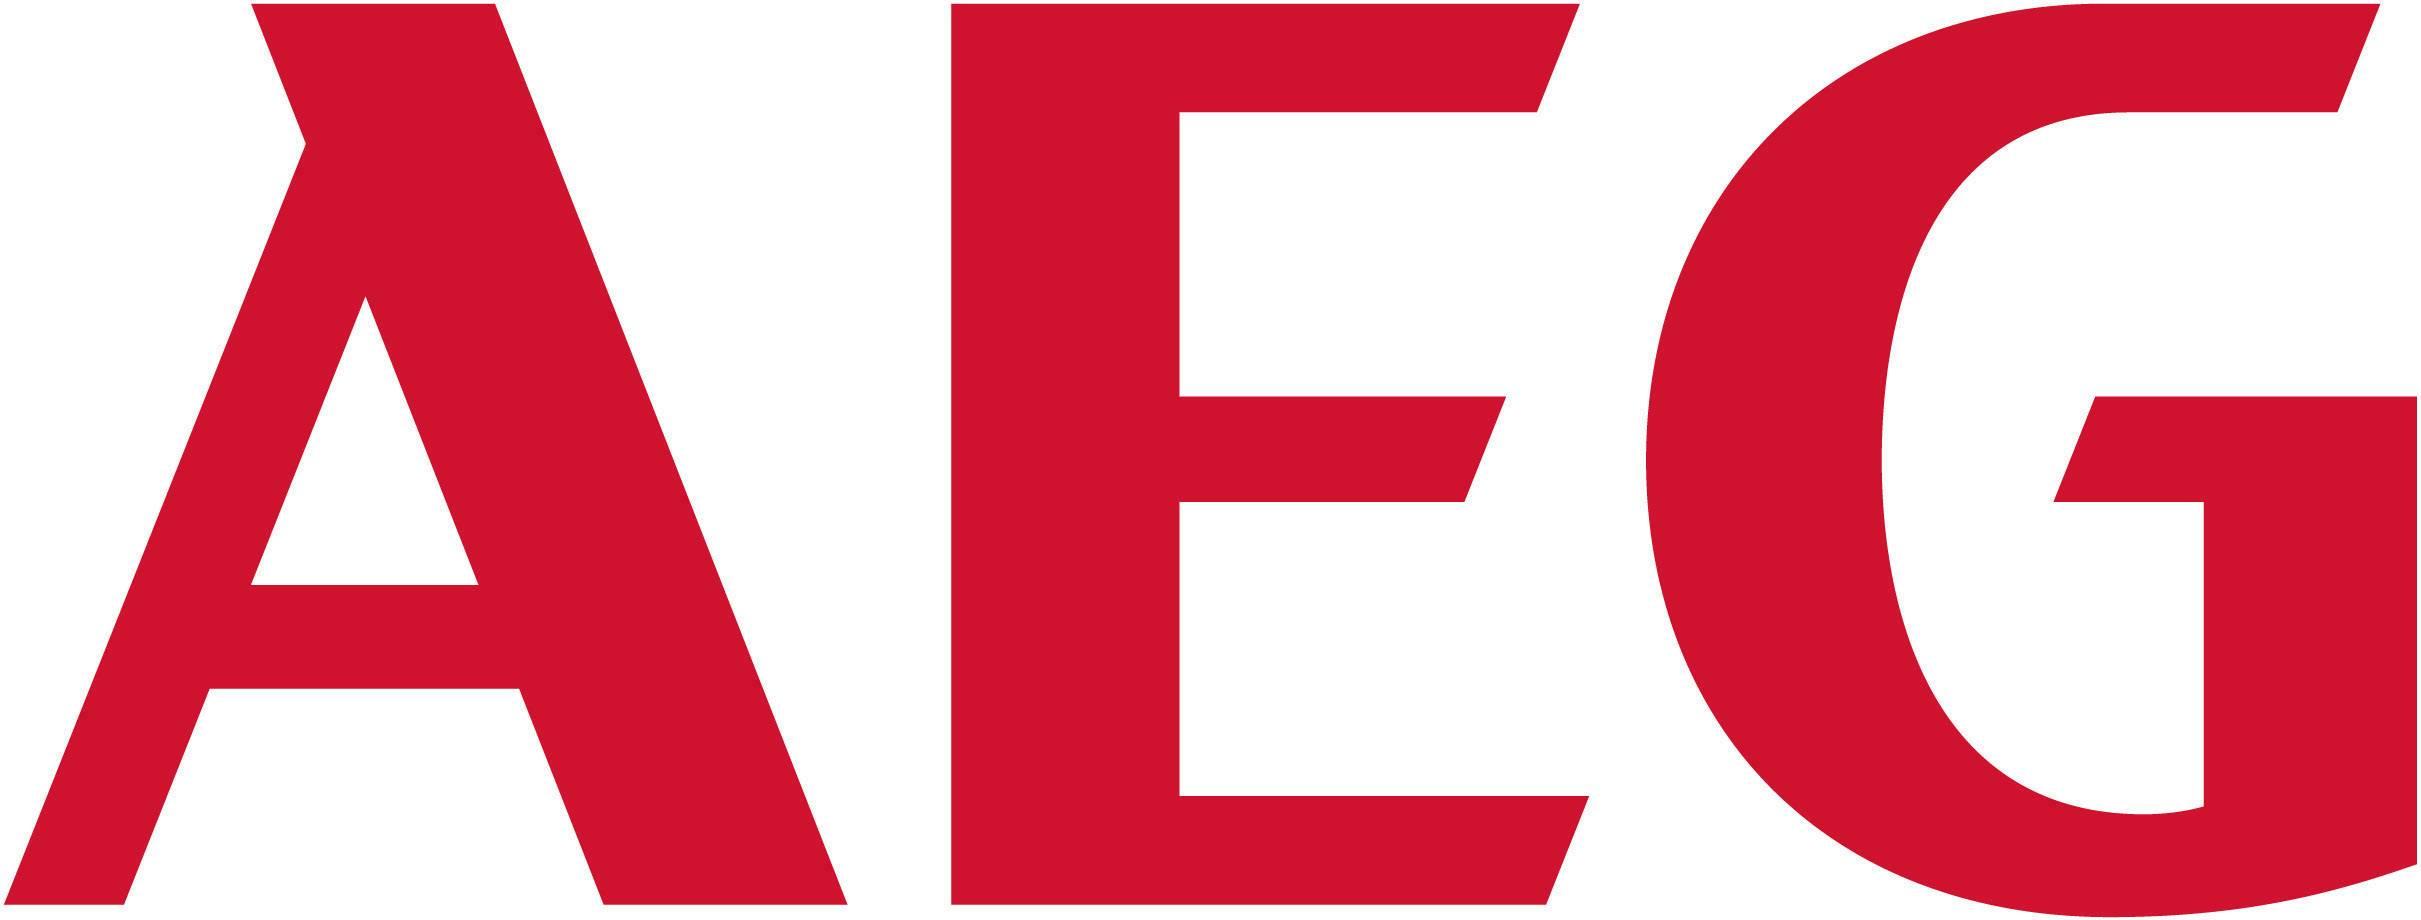 AEG MWF02 MWF02 kartuša filtra  bela